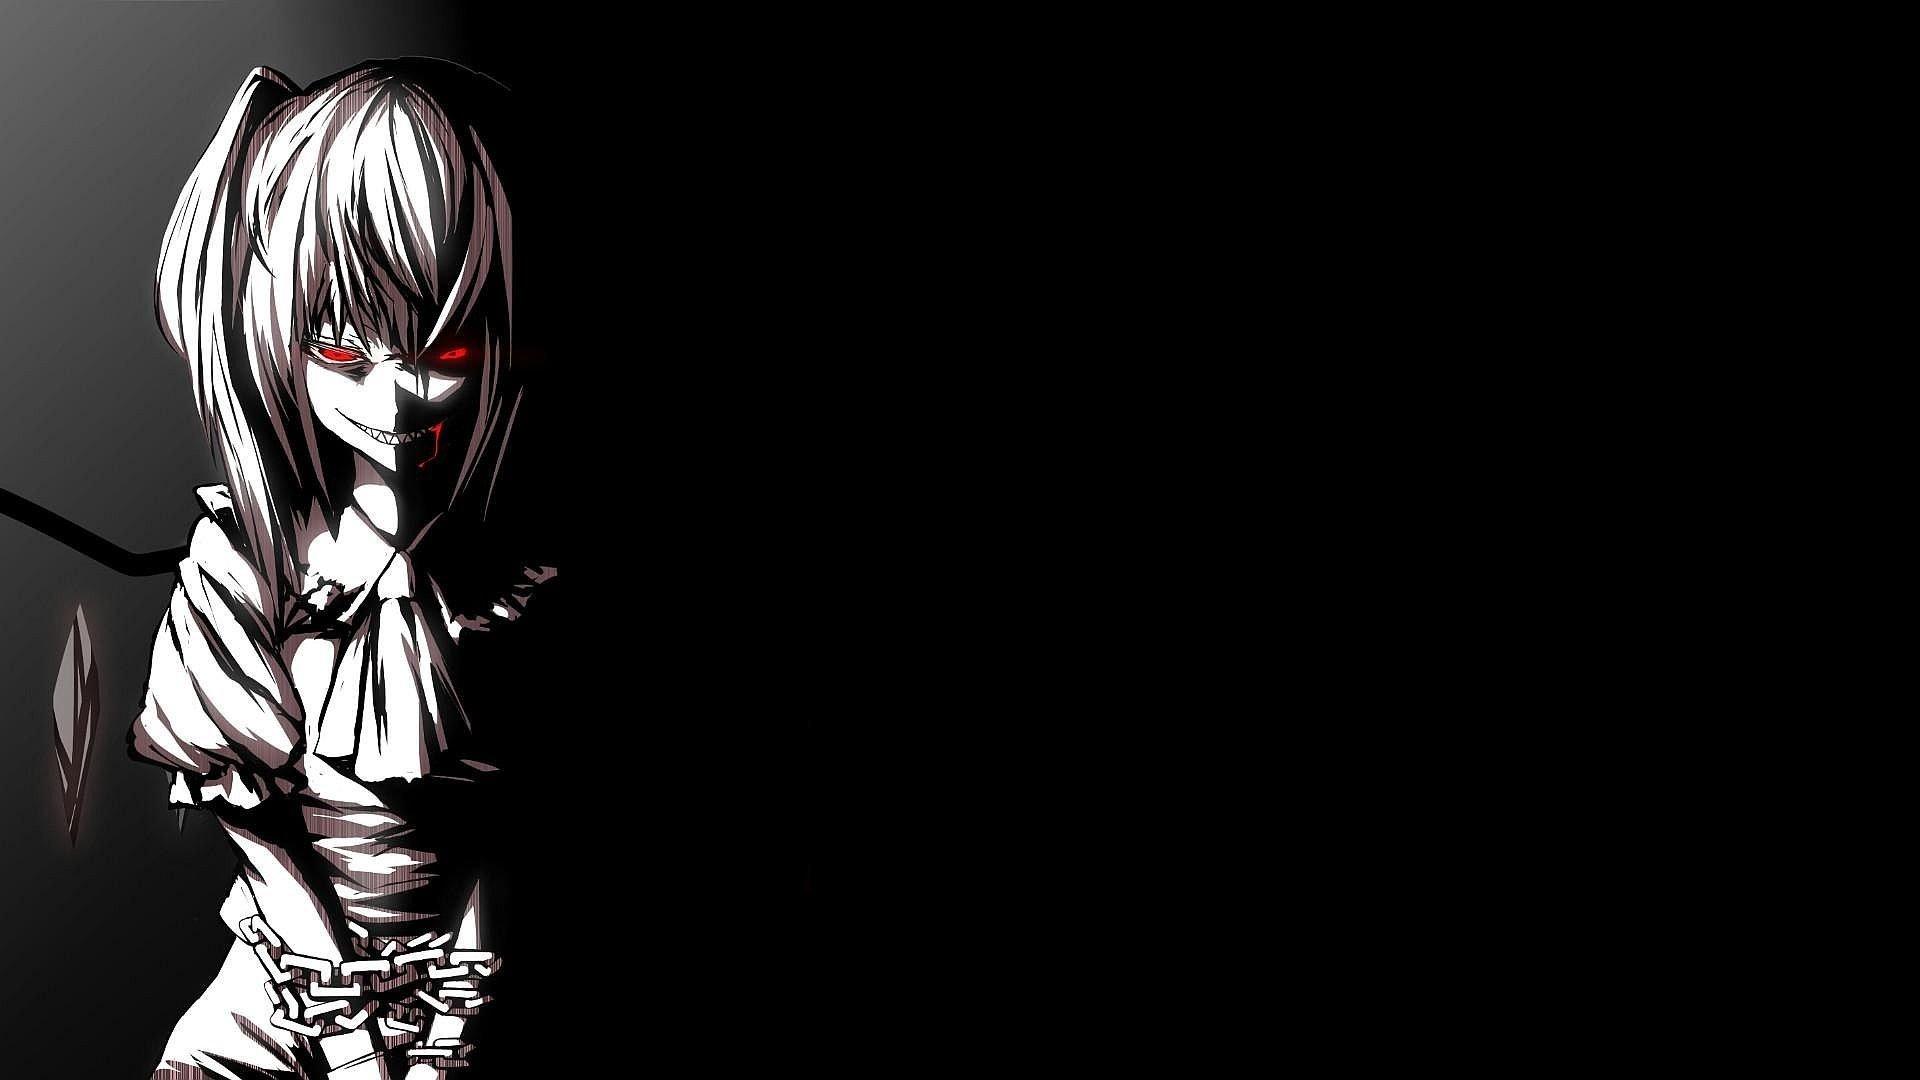 dark, Anime, Touhou, Flandre Scarlet Wallpaper